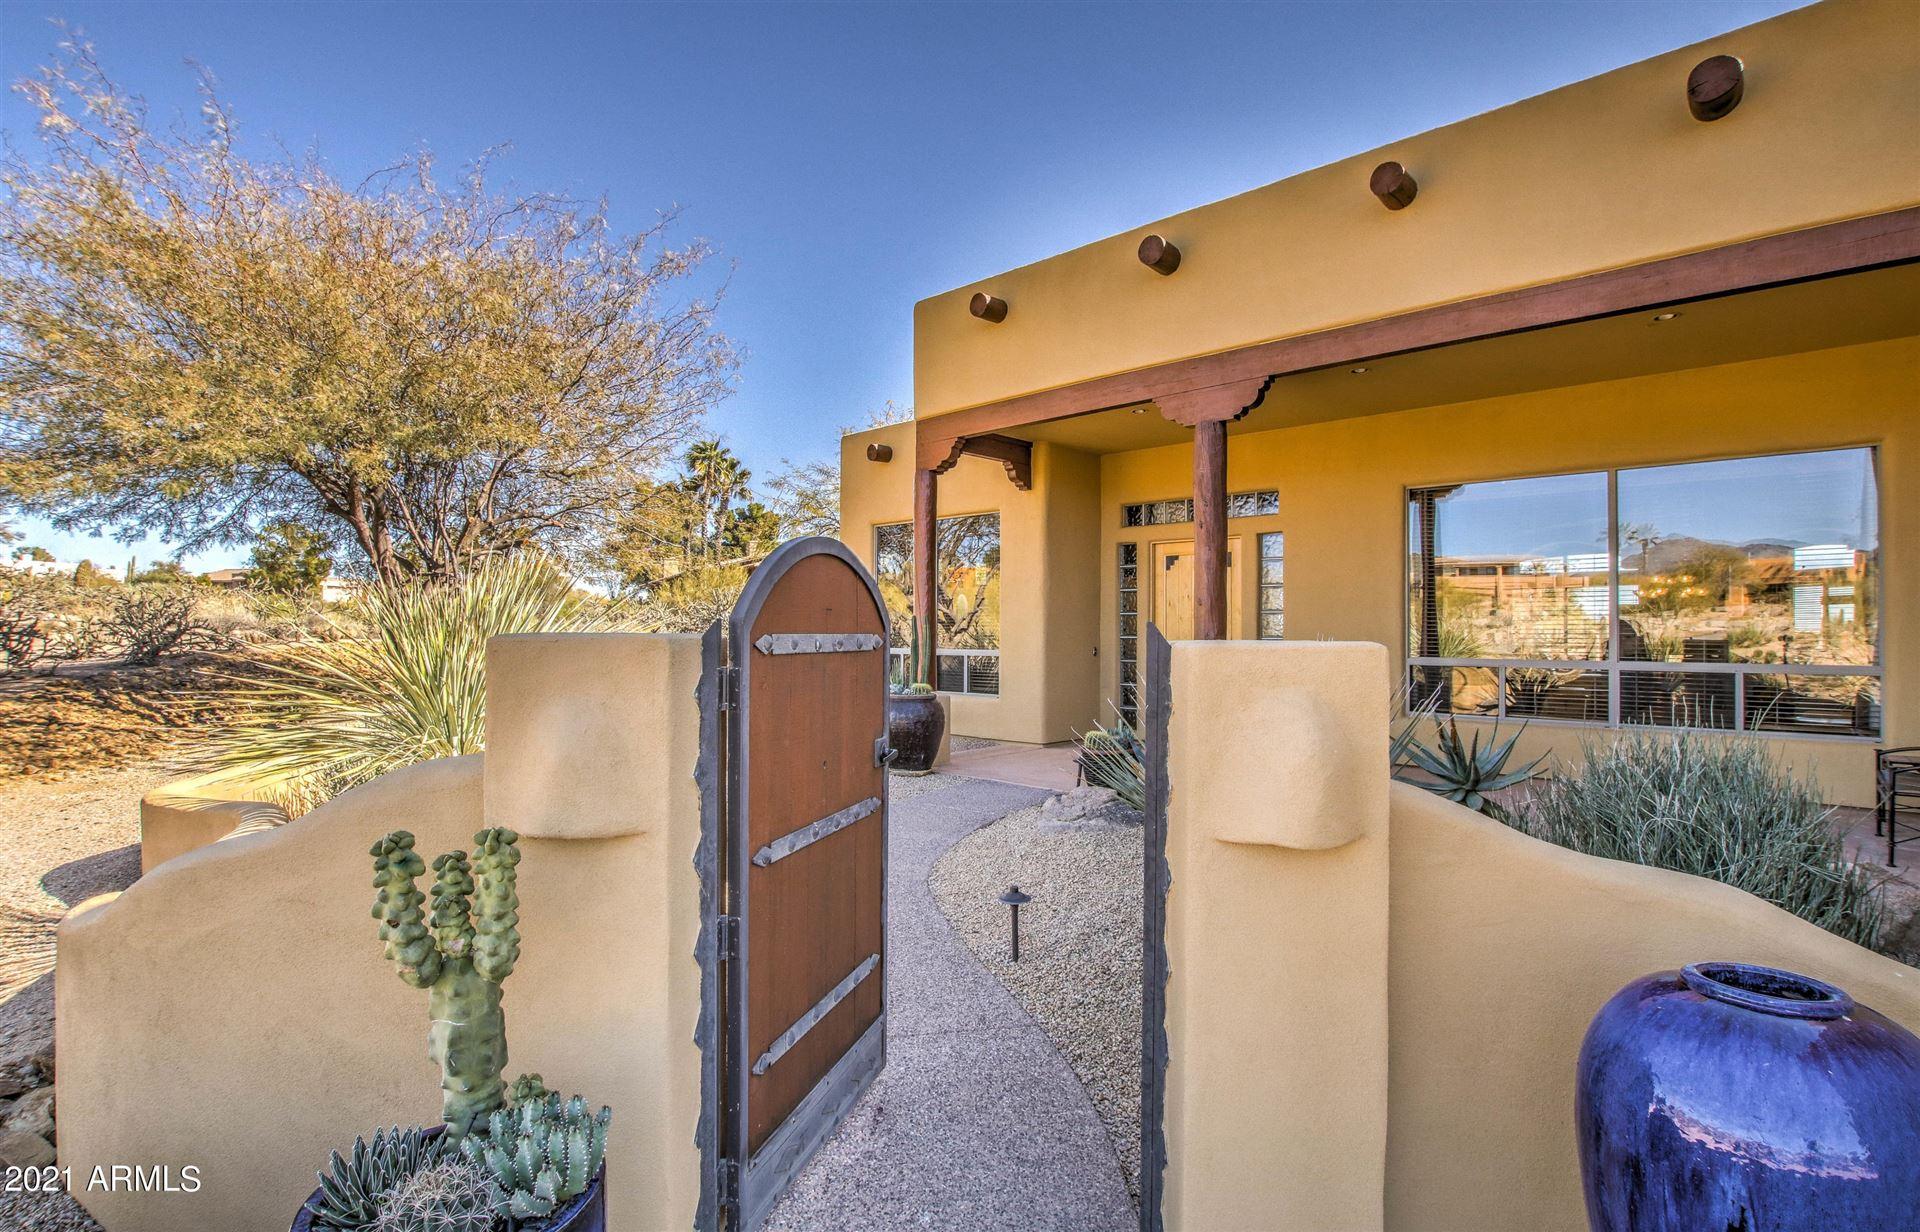 Photo of 36801 N STARDUST Lane, Carefree, AZ 85377 (MLS # 6200409)